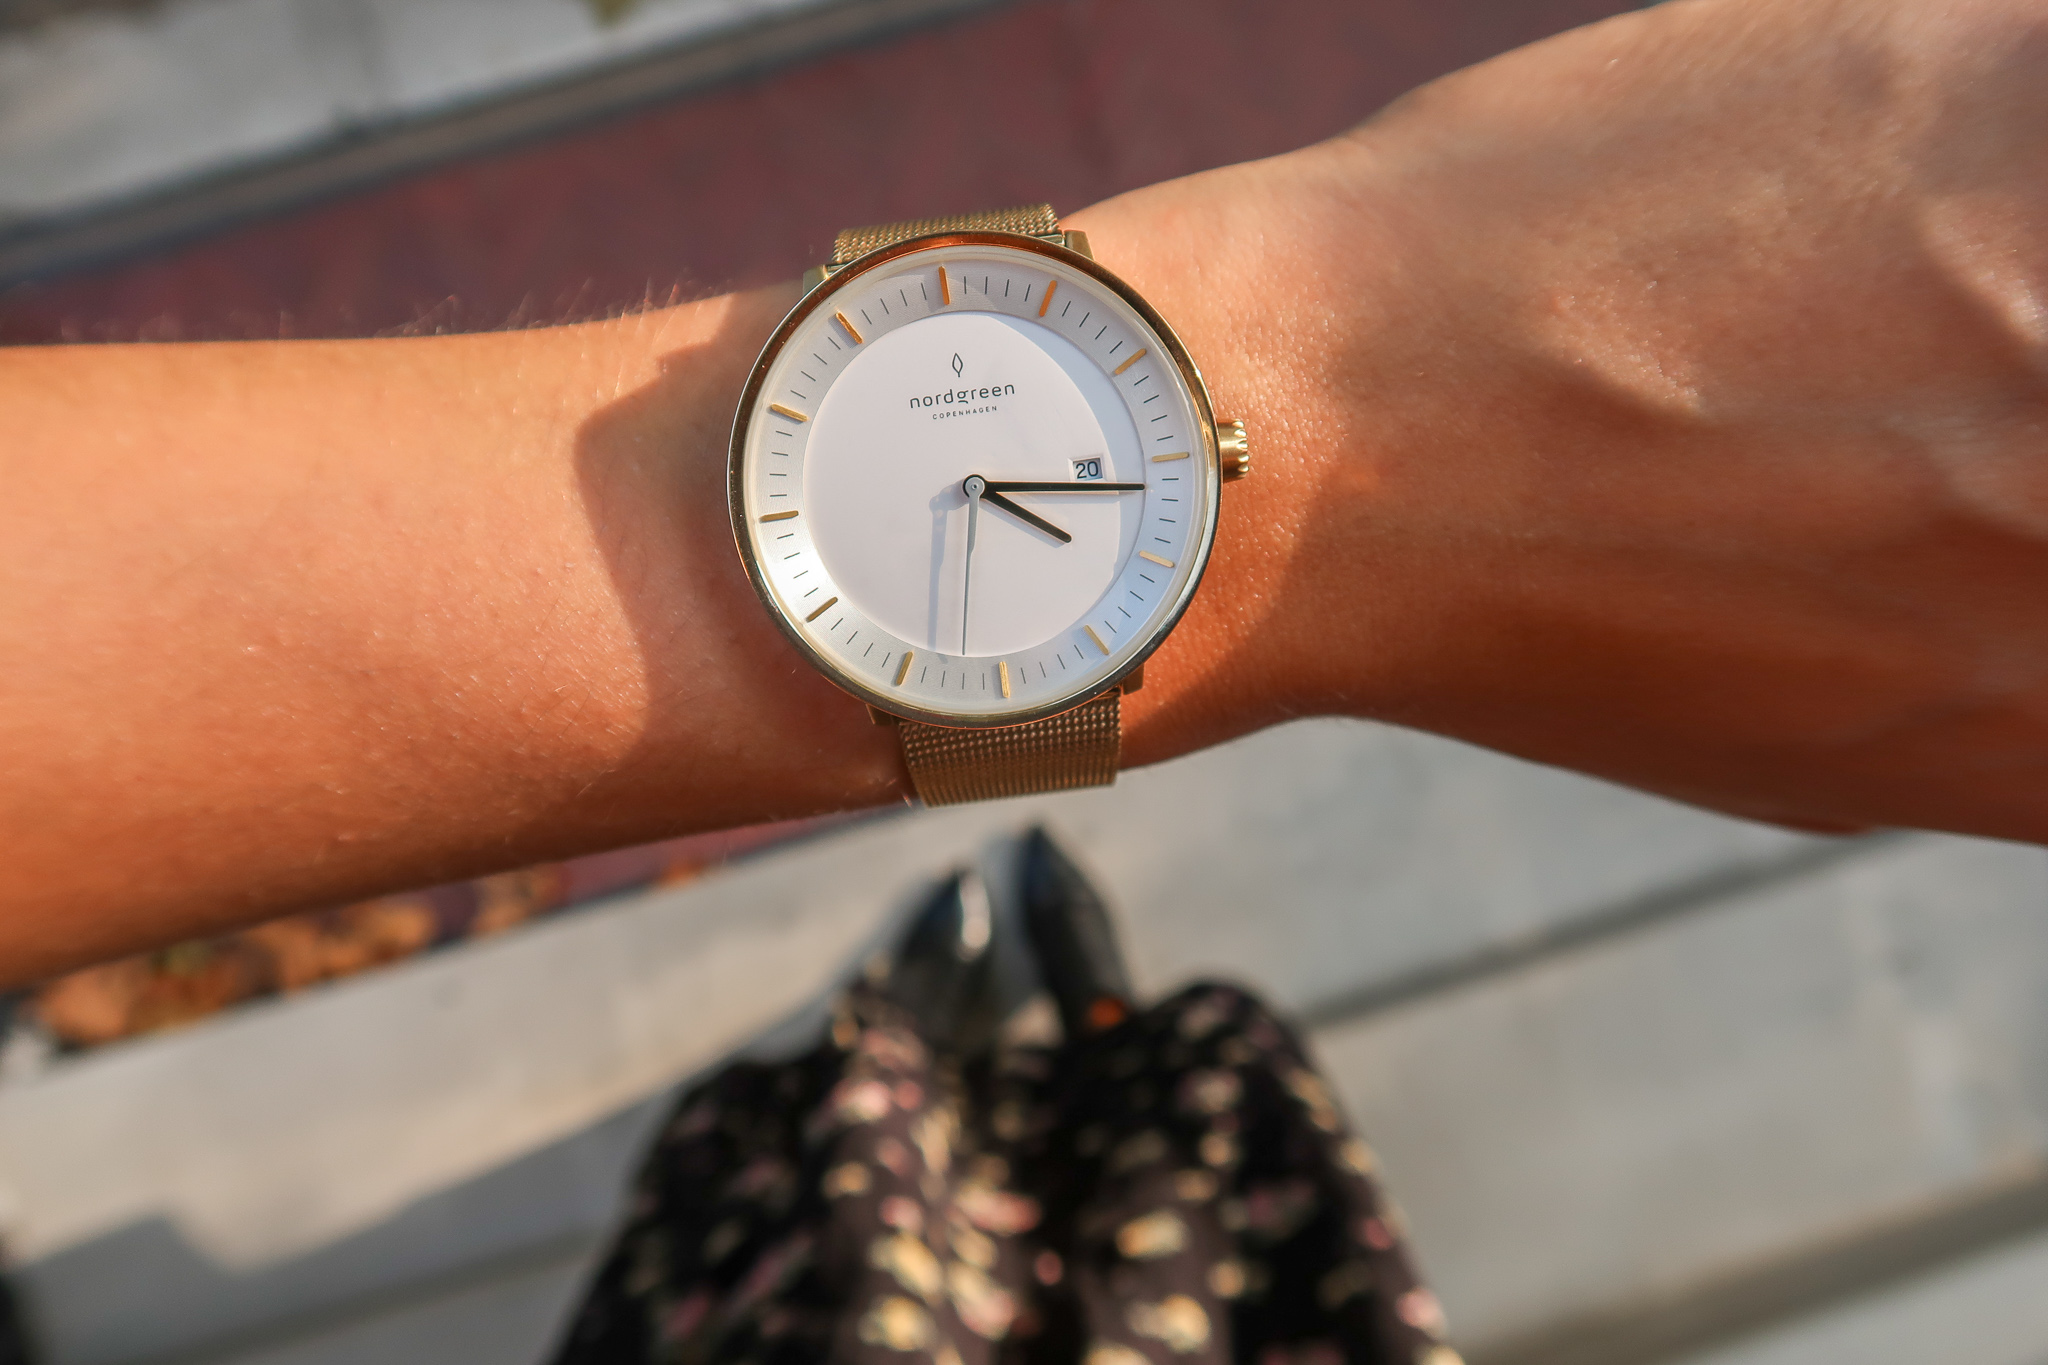 Nordgreen women's watch peexo